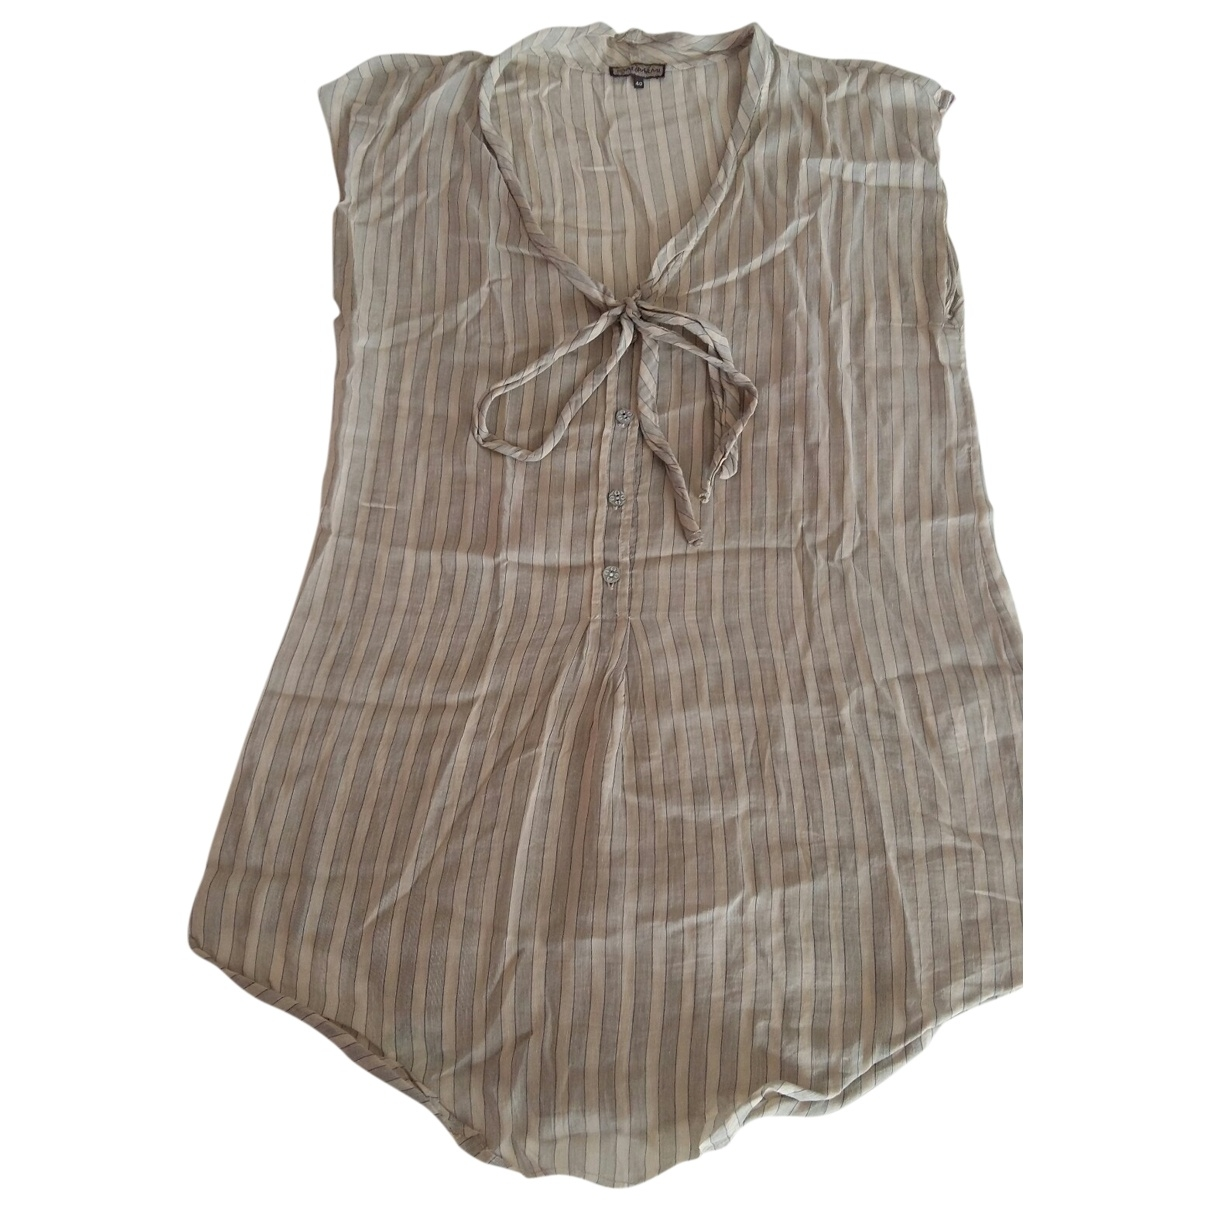 Maliparmi \N Ecru Cotton  top for Women 40 IT